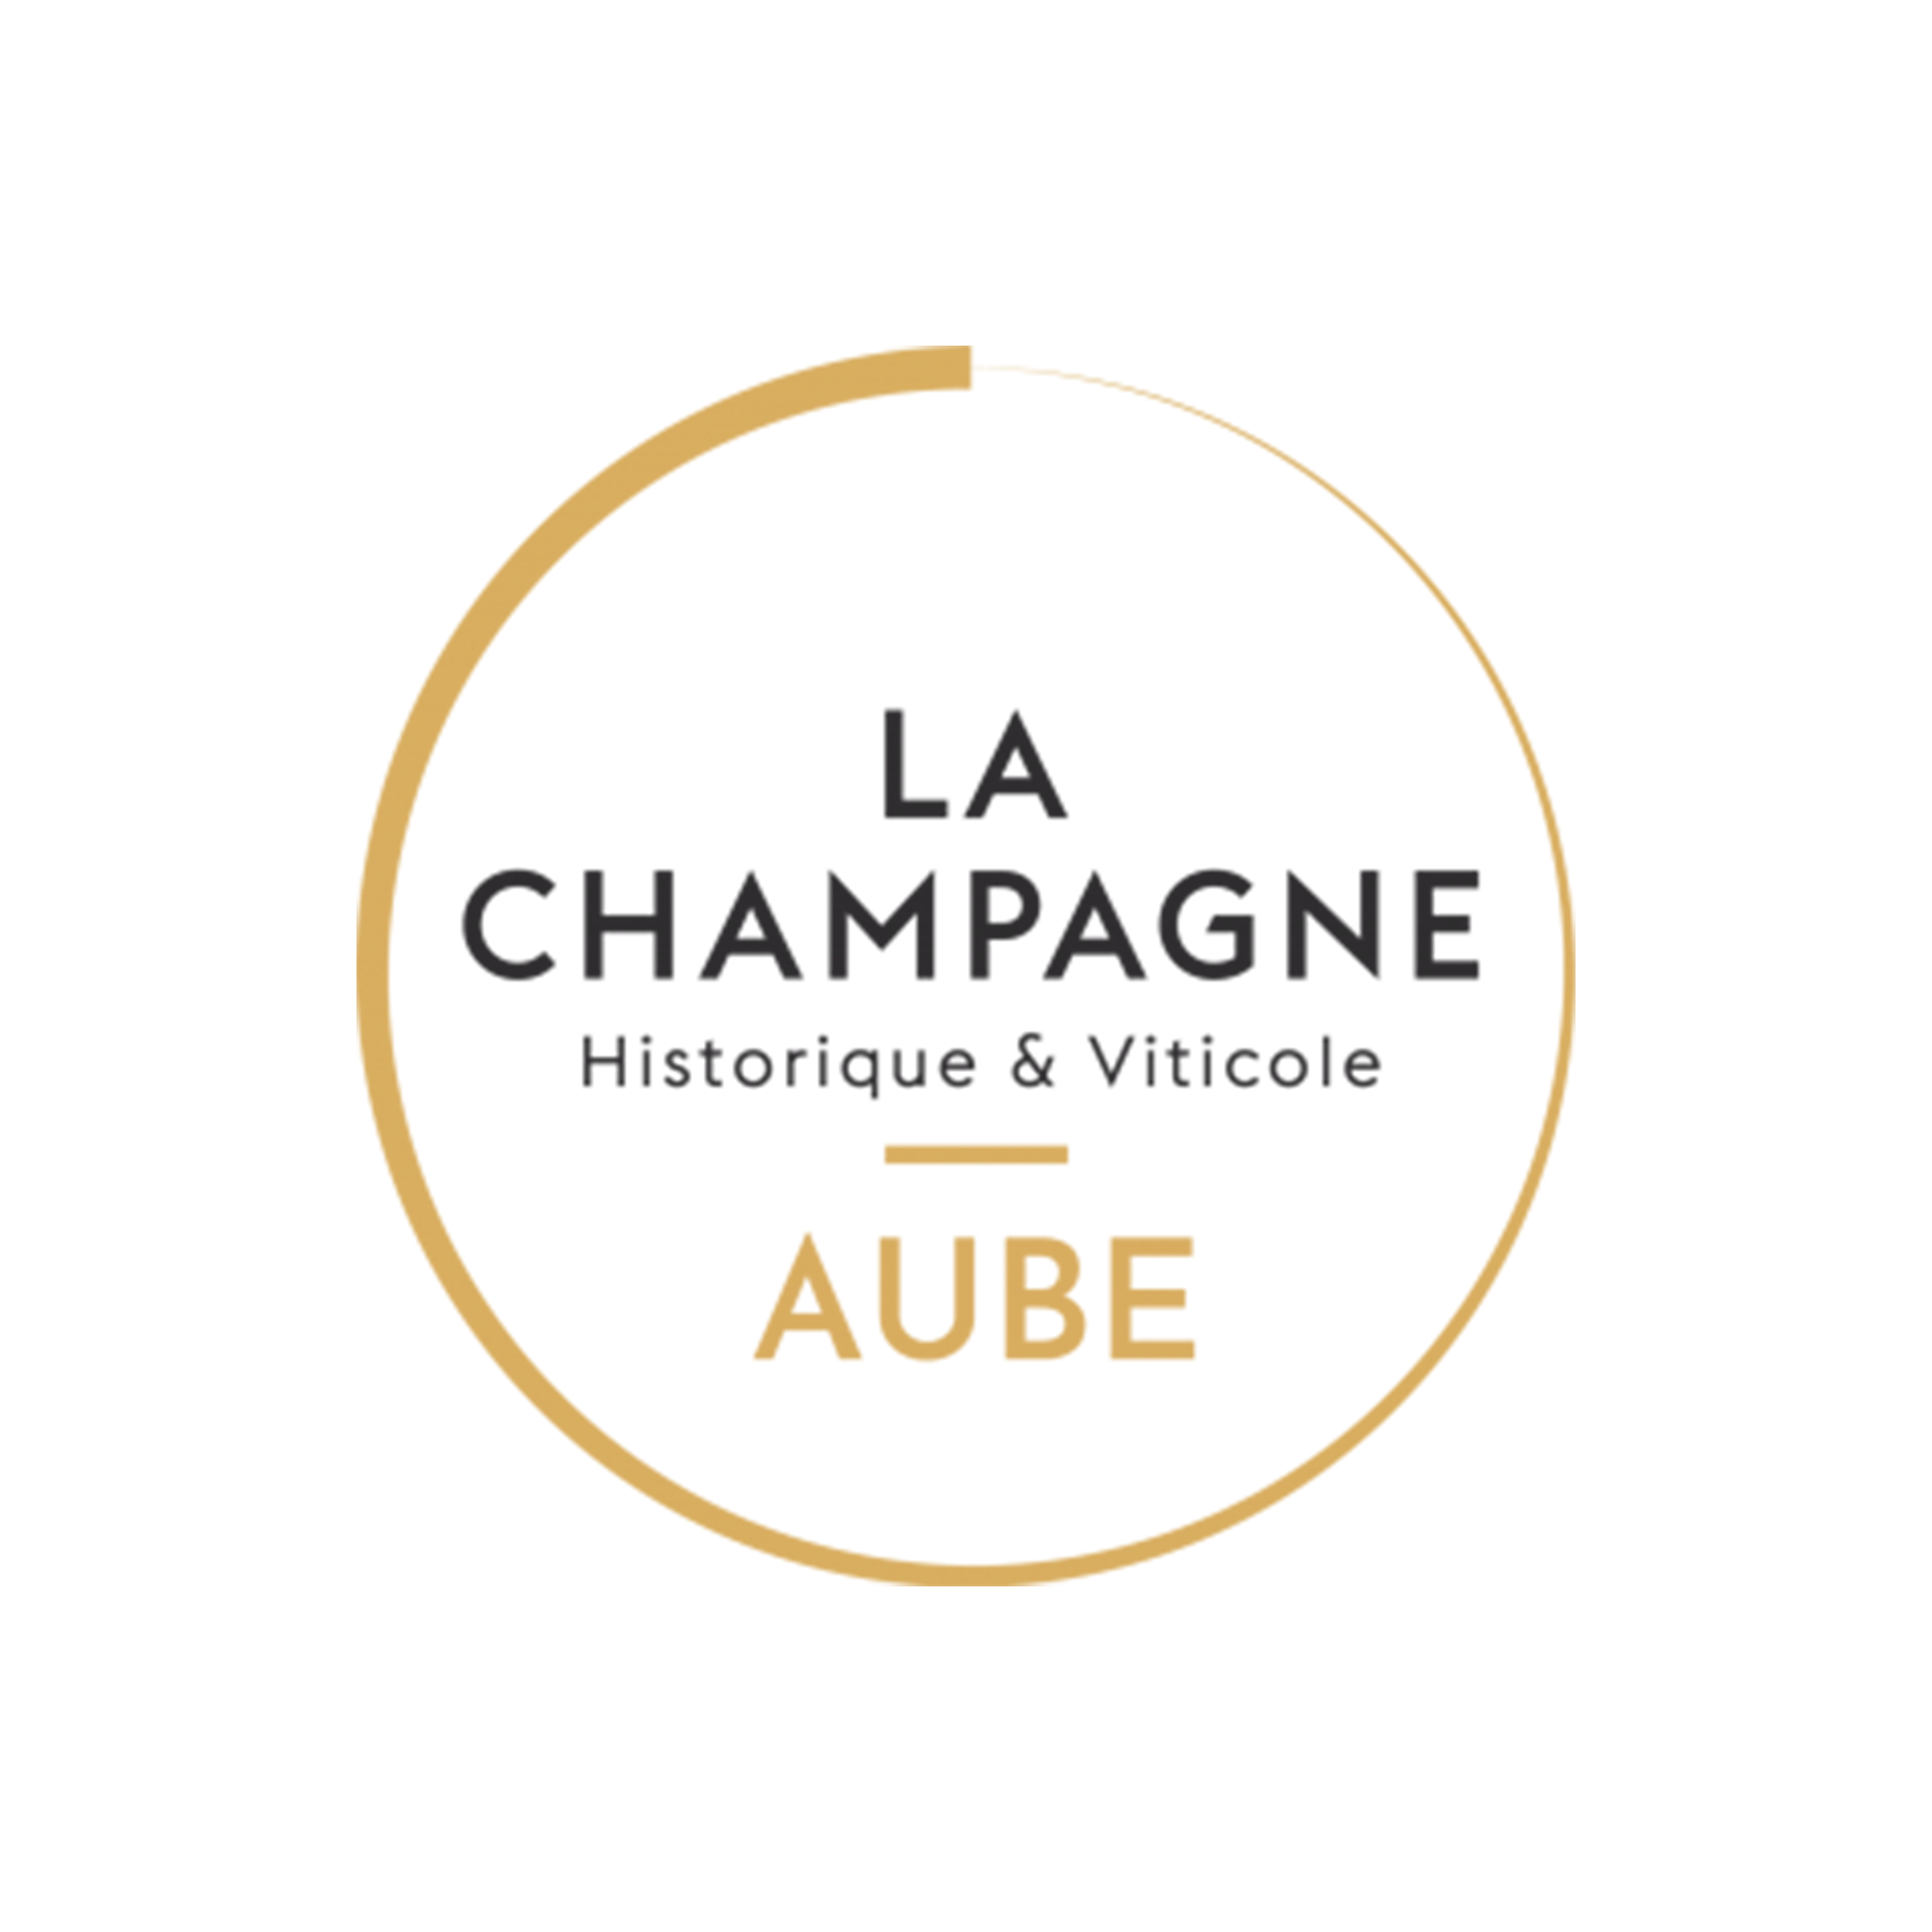 AUBE-Champagne